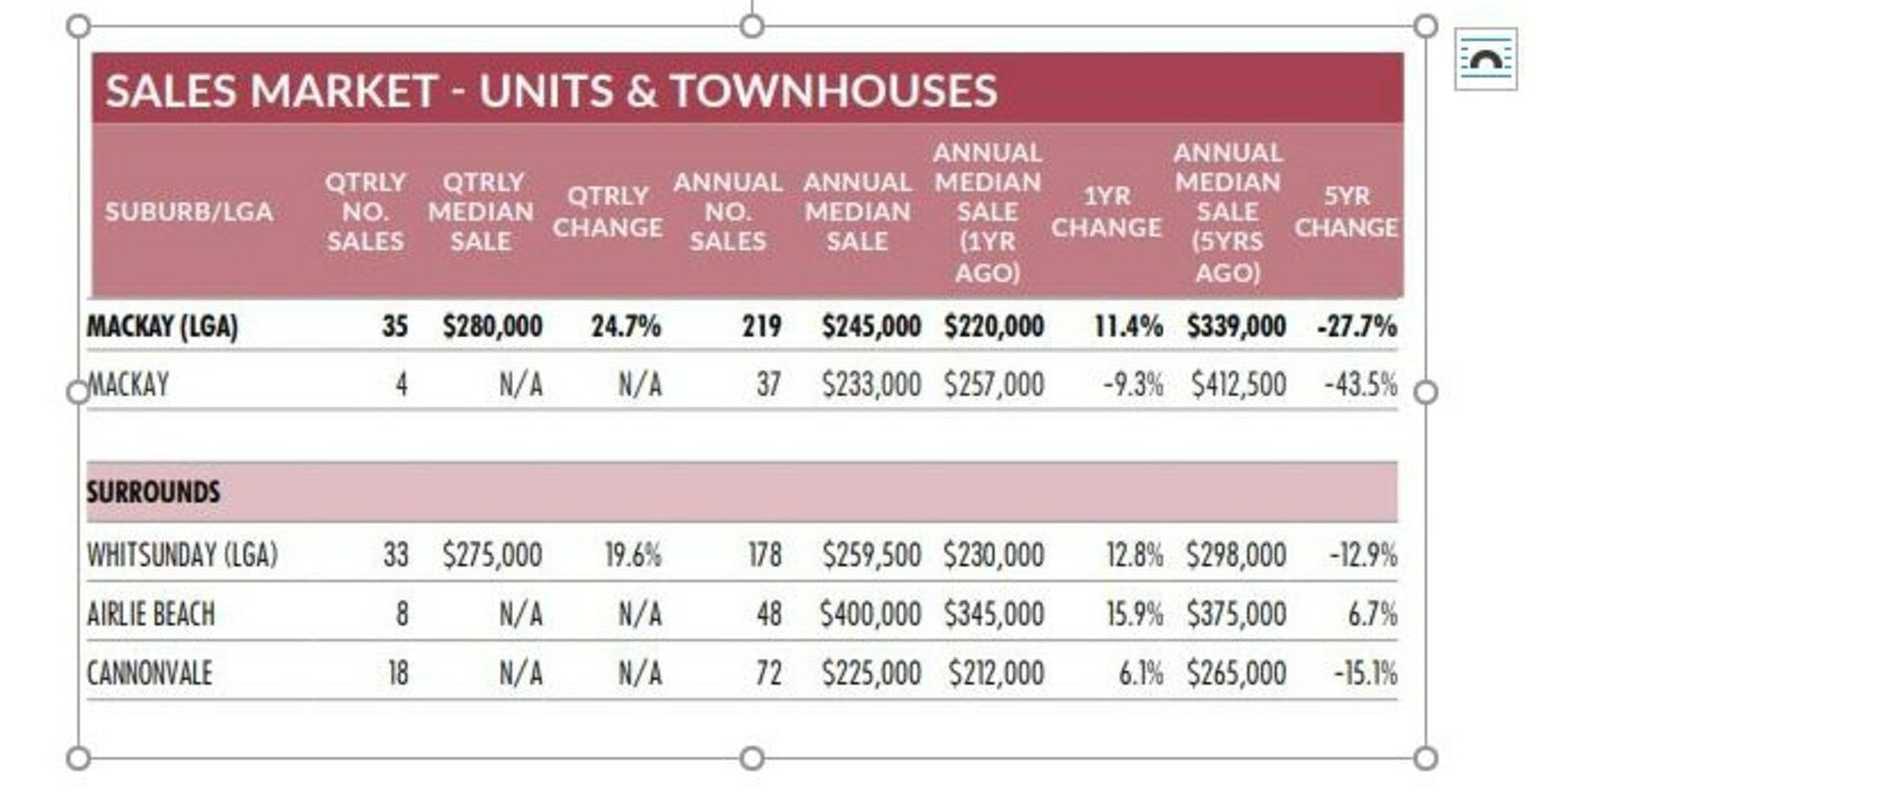 Unit sales broken down by suburb in Mackay.